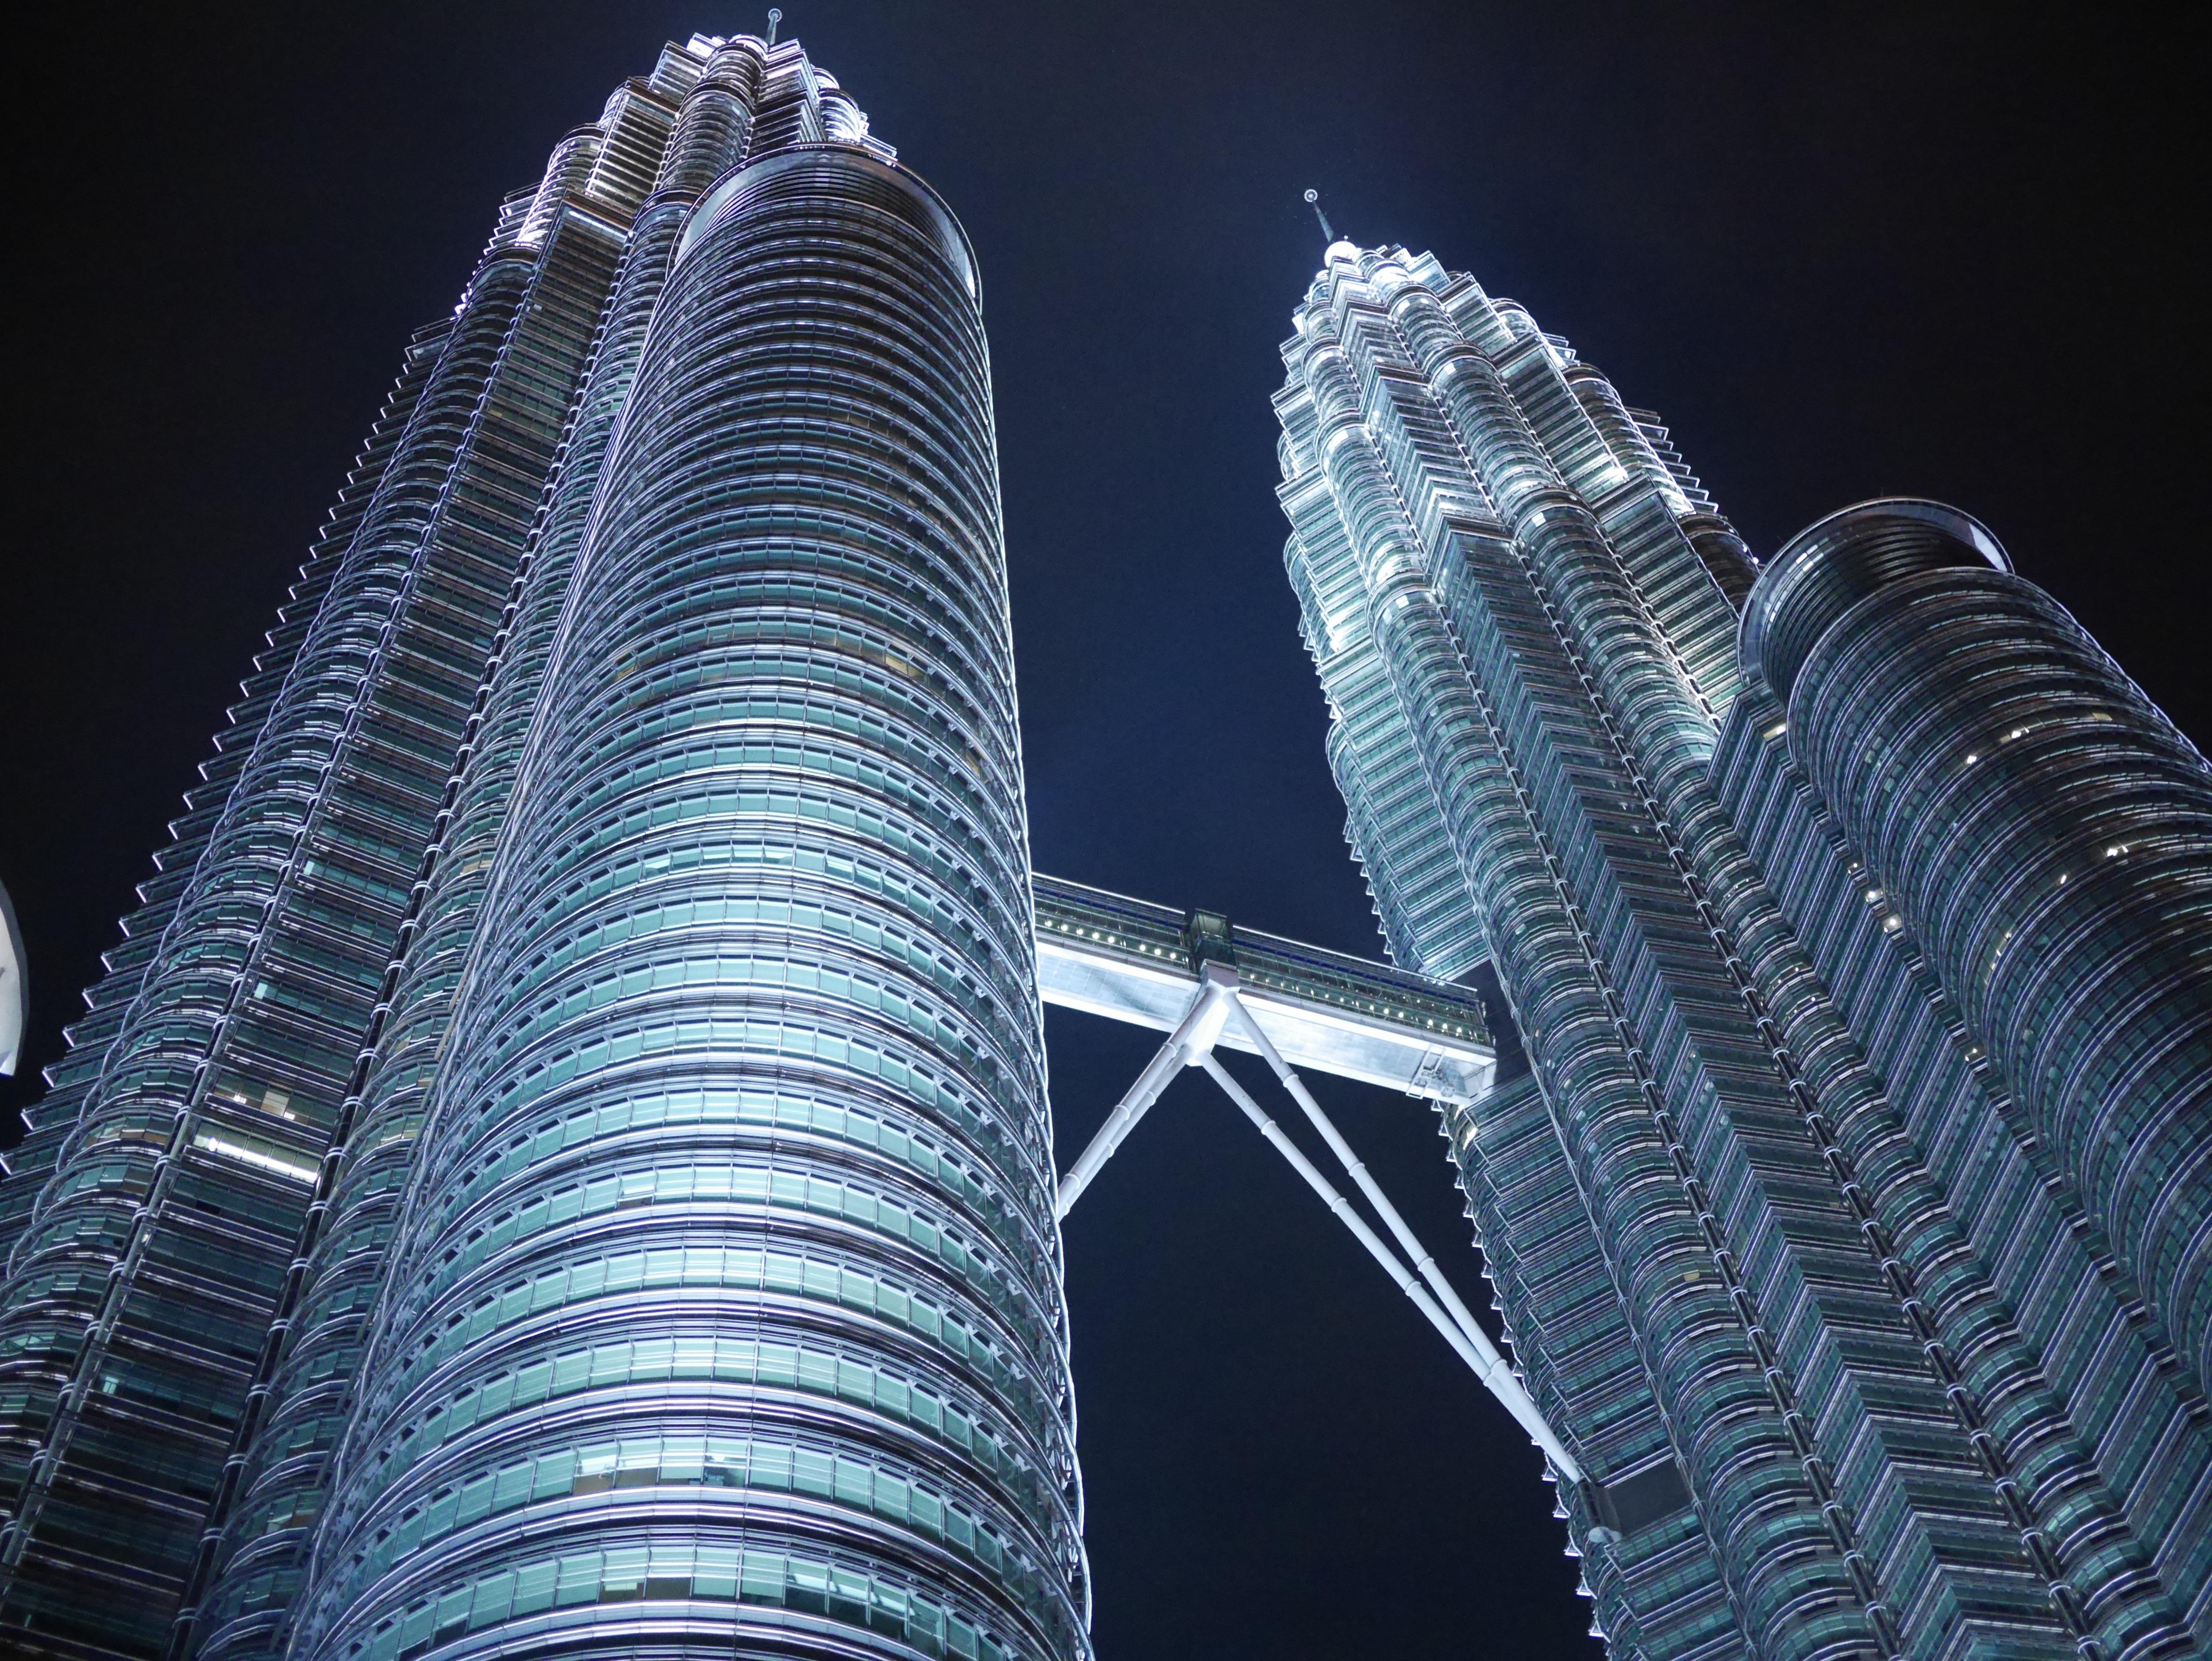 Fotos gratis arquitectura noche edificio rascacielos for Arquitectura en linea gratis